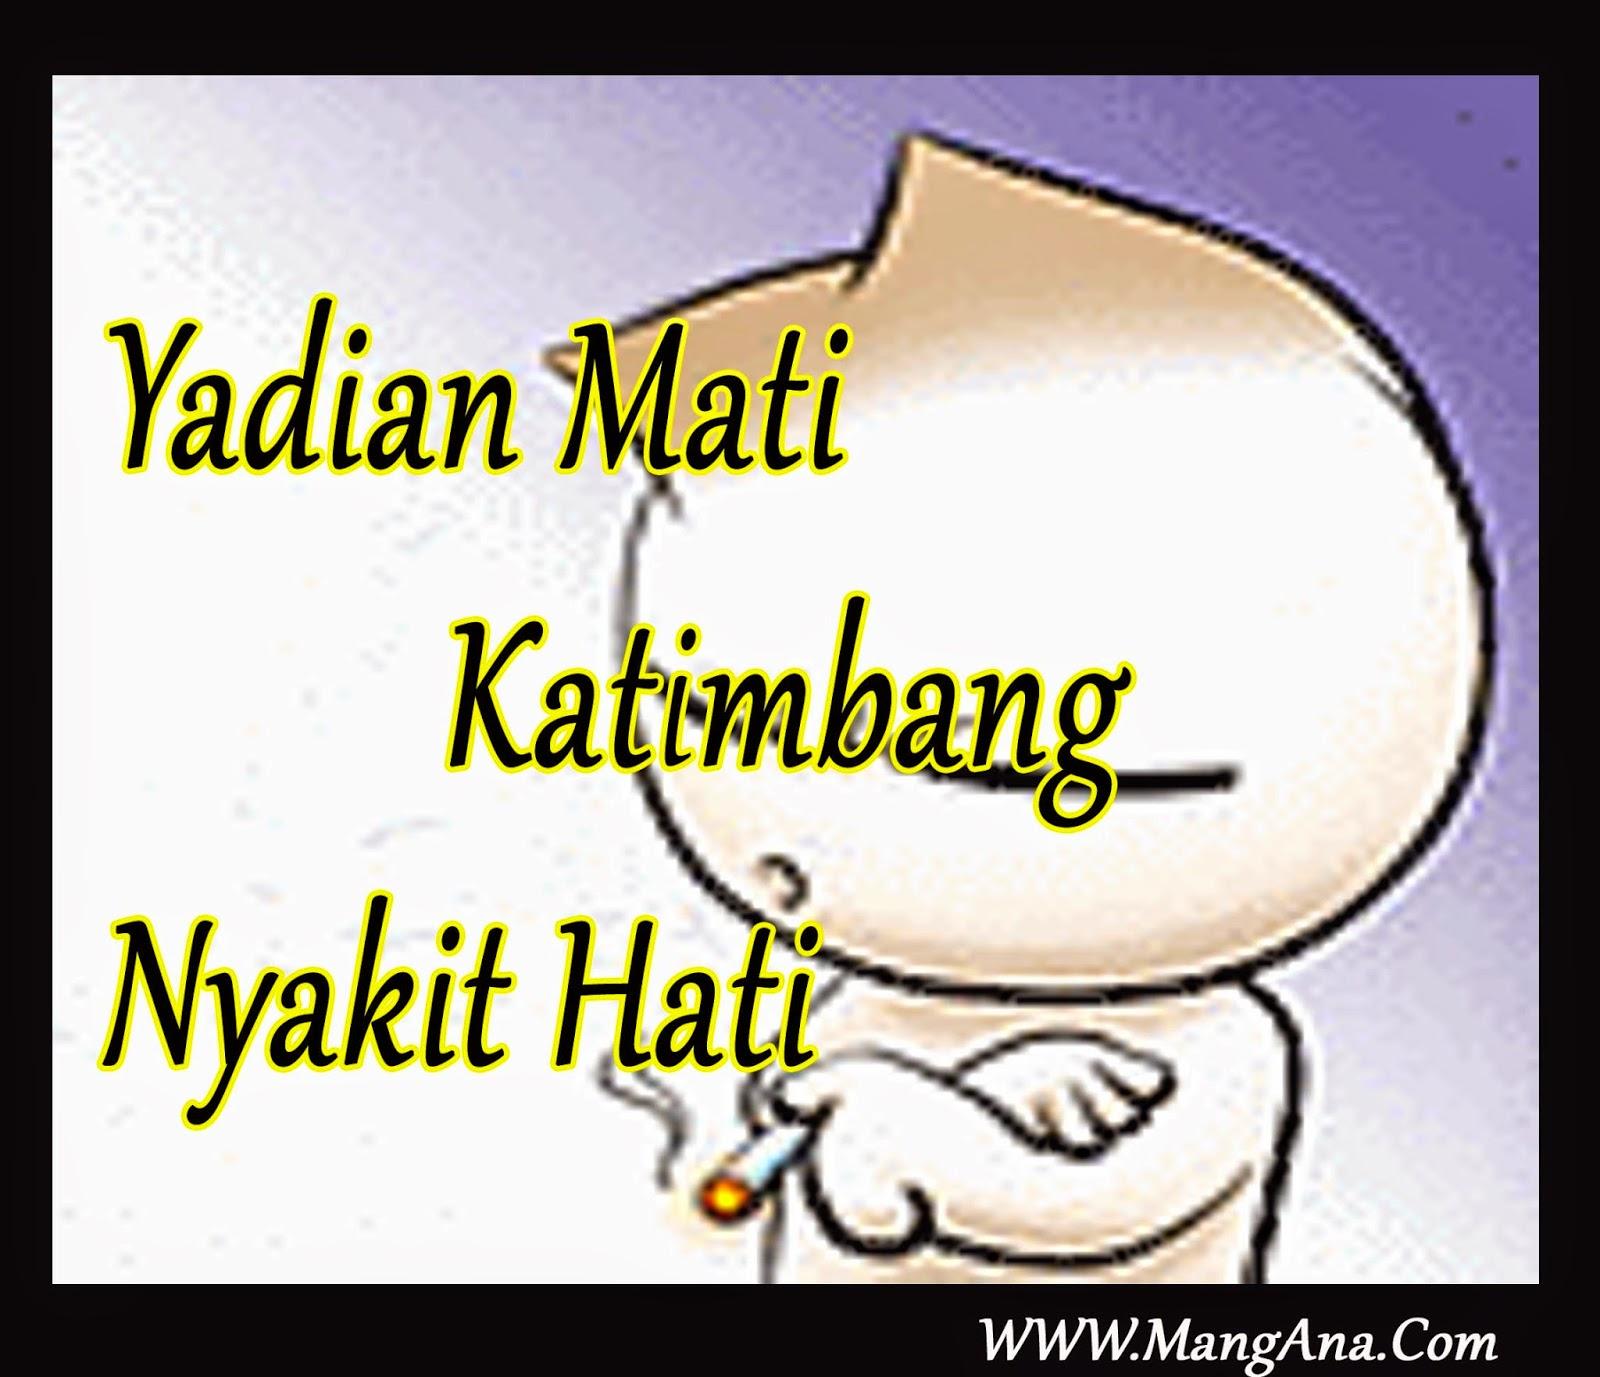 Gambar Kata Kata Berbahasa Bali Gambar Kata Kata Berbahasa Bali